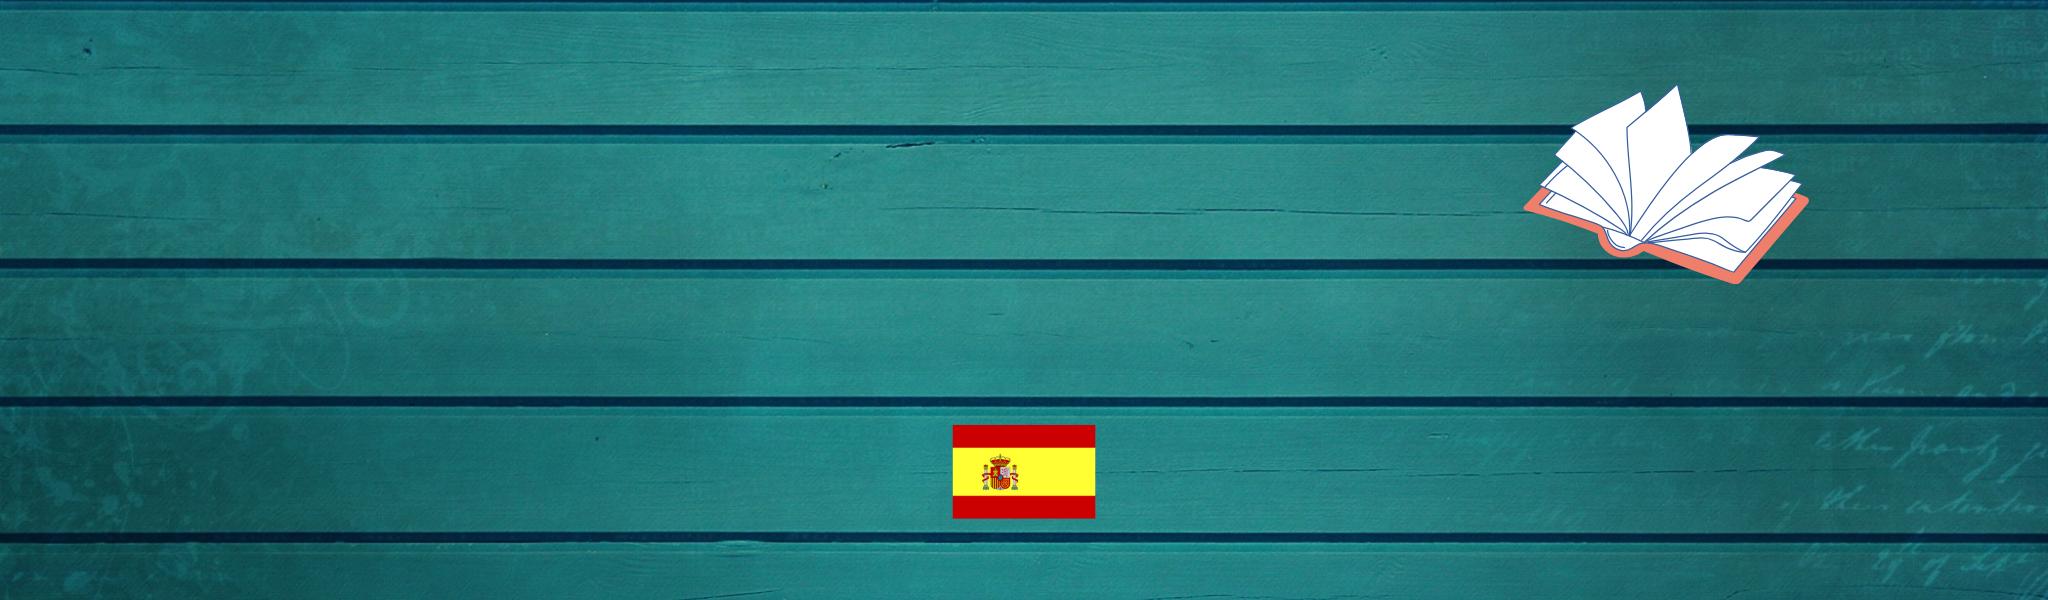 ECU101 Attendee Course Book website header Spanish